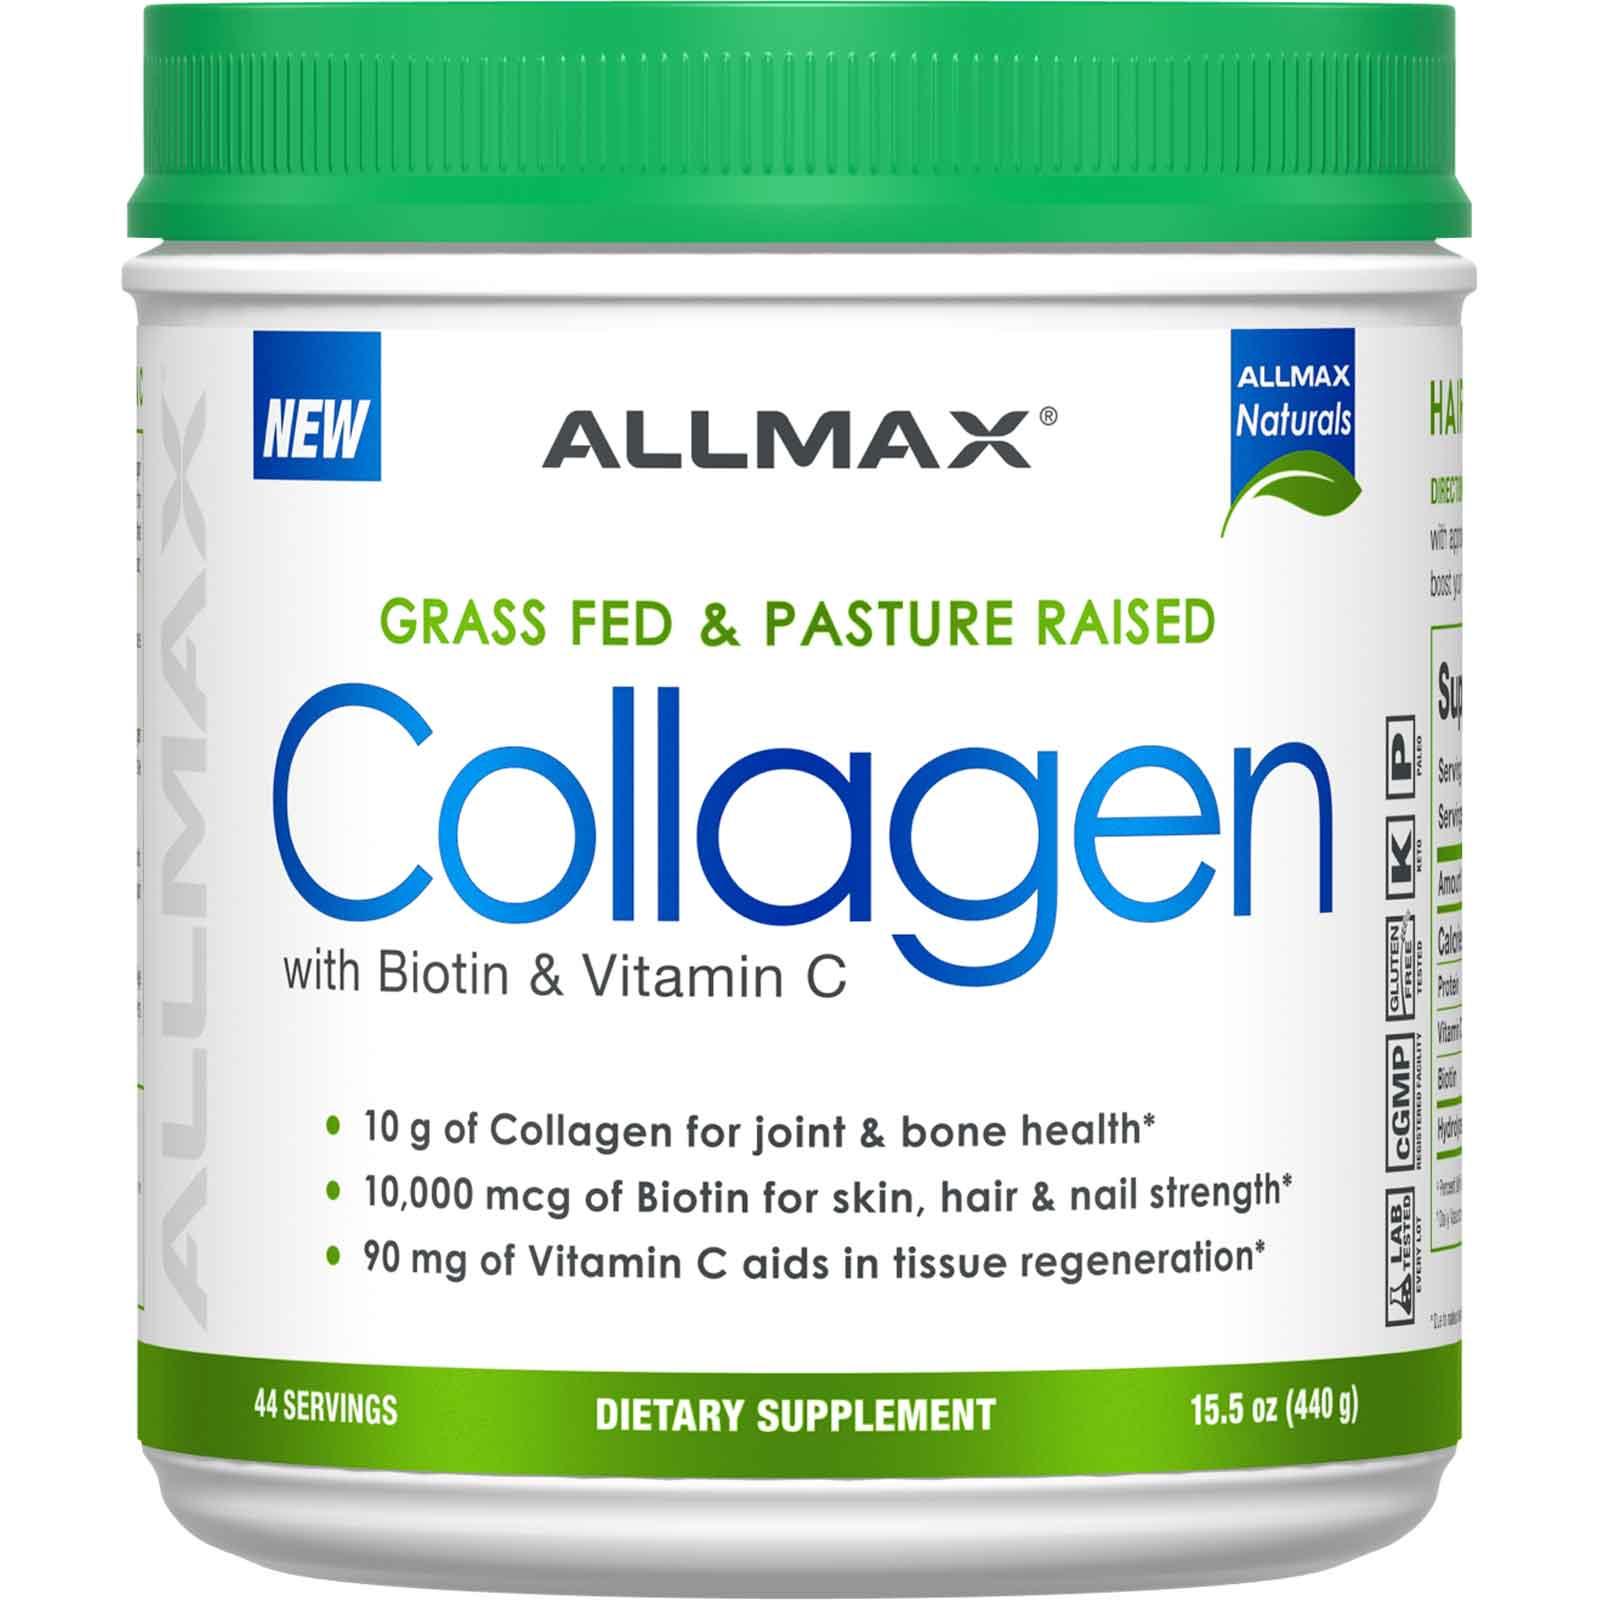 ALLMAX Nutrition, Экологически чистый коллаген с 10 000 мкг биотина + 90 мг витамина C, 440 г (15,5 унции)